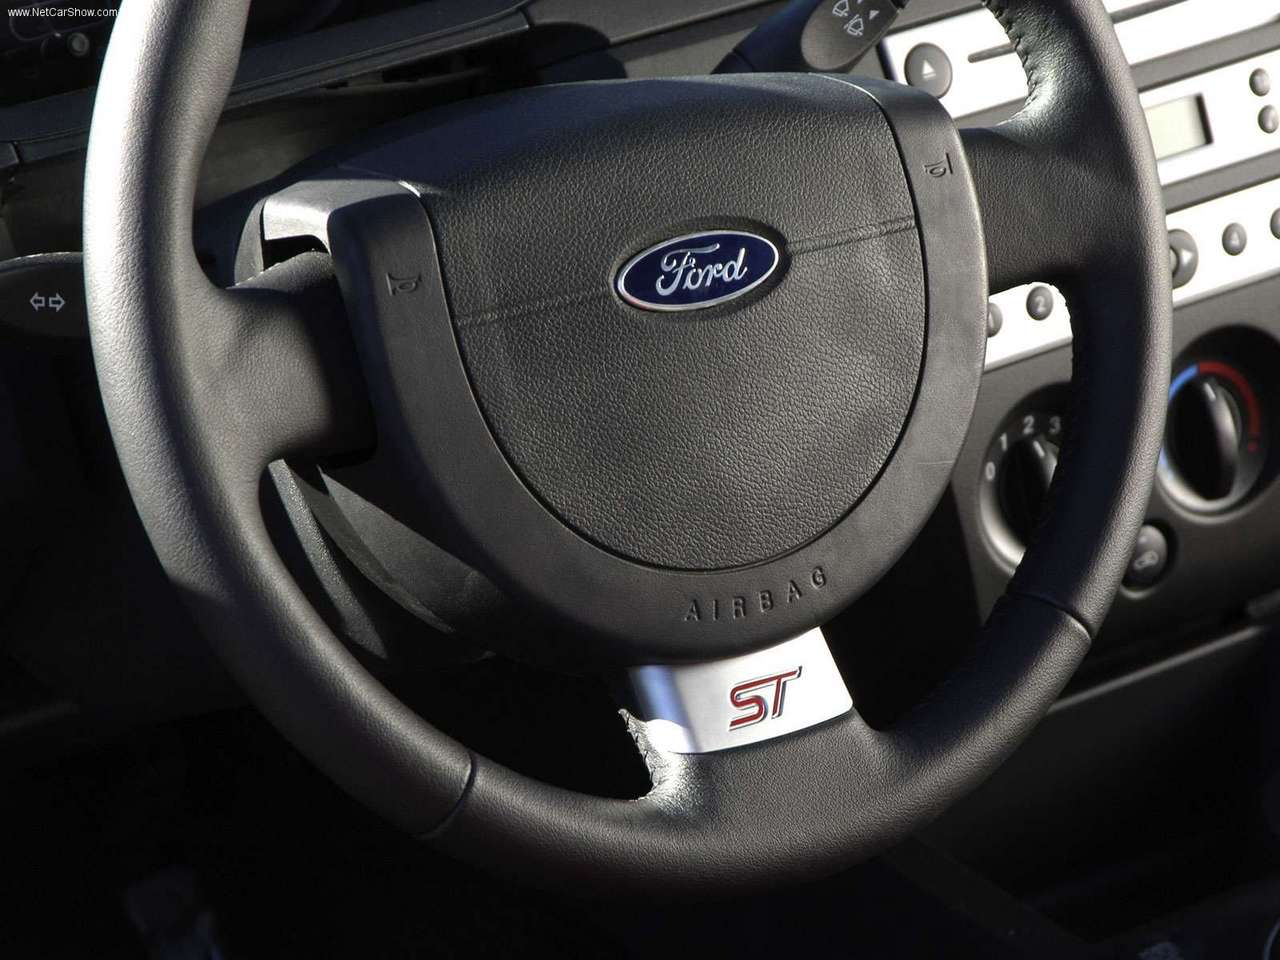 Ford Fiesta ST, Ford Fiesta, Ford, Fiesta, Fiesta ST, ST, ST150, hot hatch, Zetec S, fun car, cheap car, modified car, motoring, automotive, car, cars, classic car, retro car, old car, autotrader, ebay, ebay motors